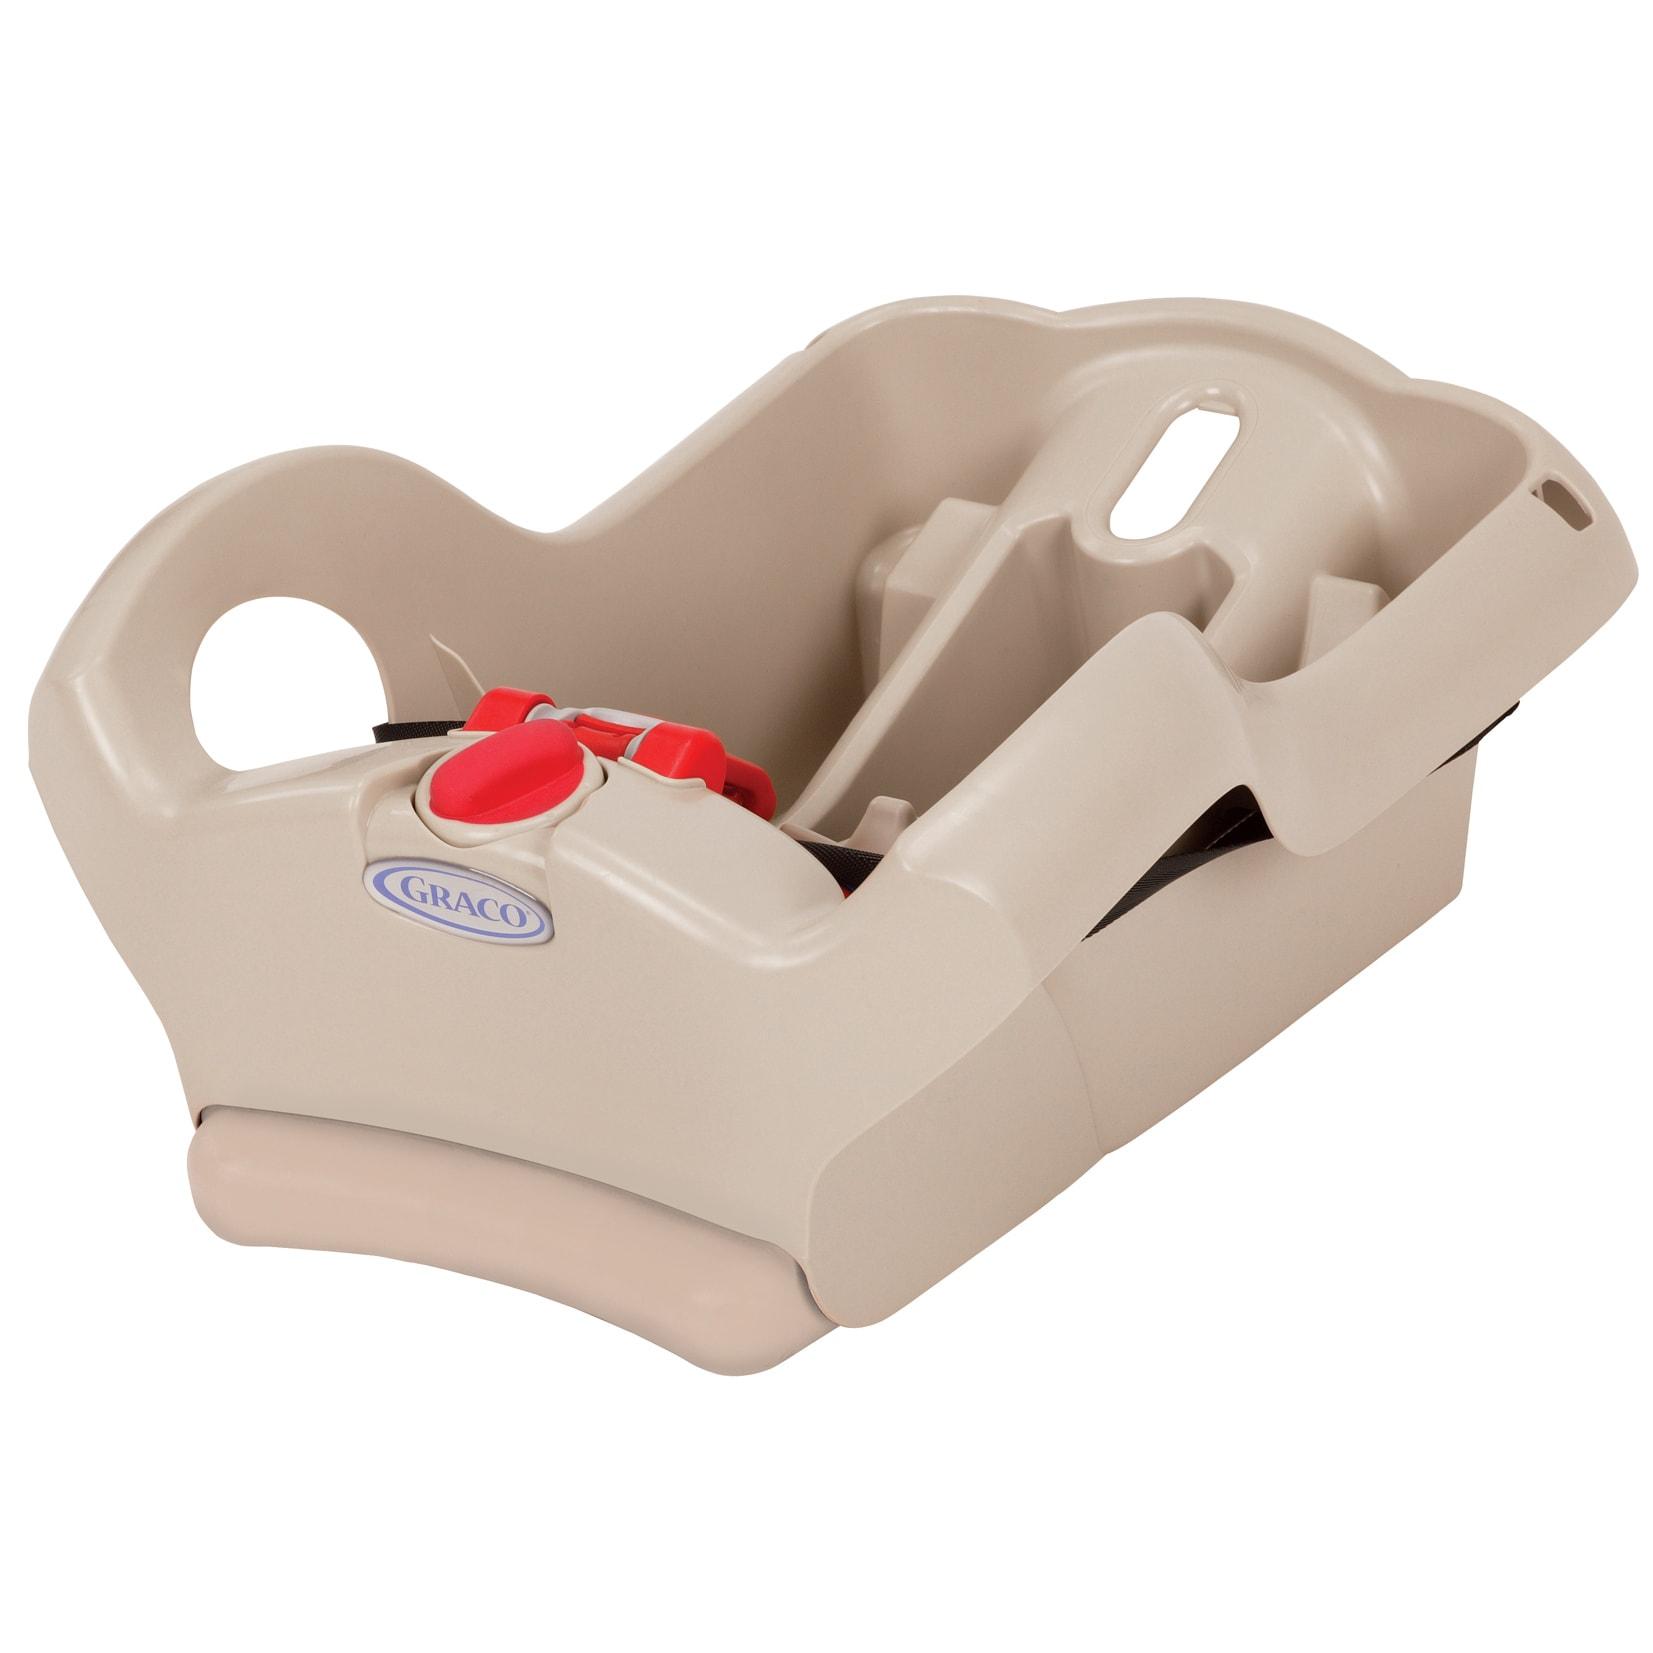 Graco SnugRide 30 35 Infant Car Seat Base